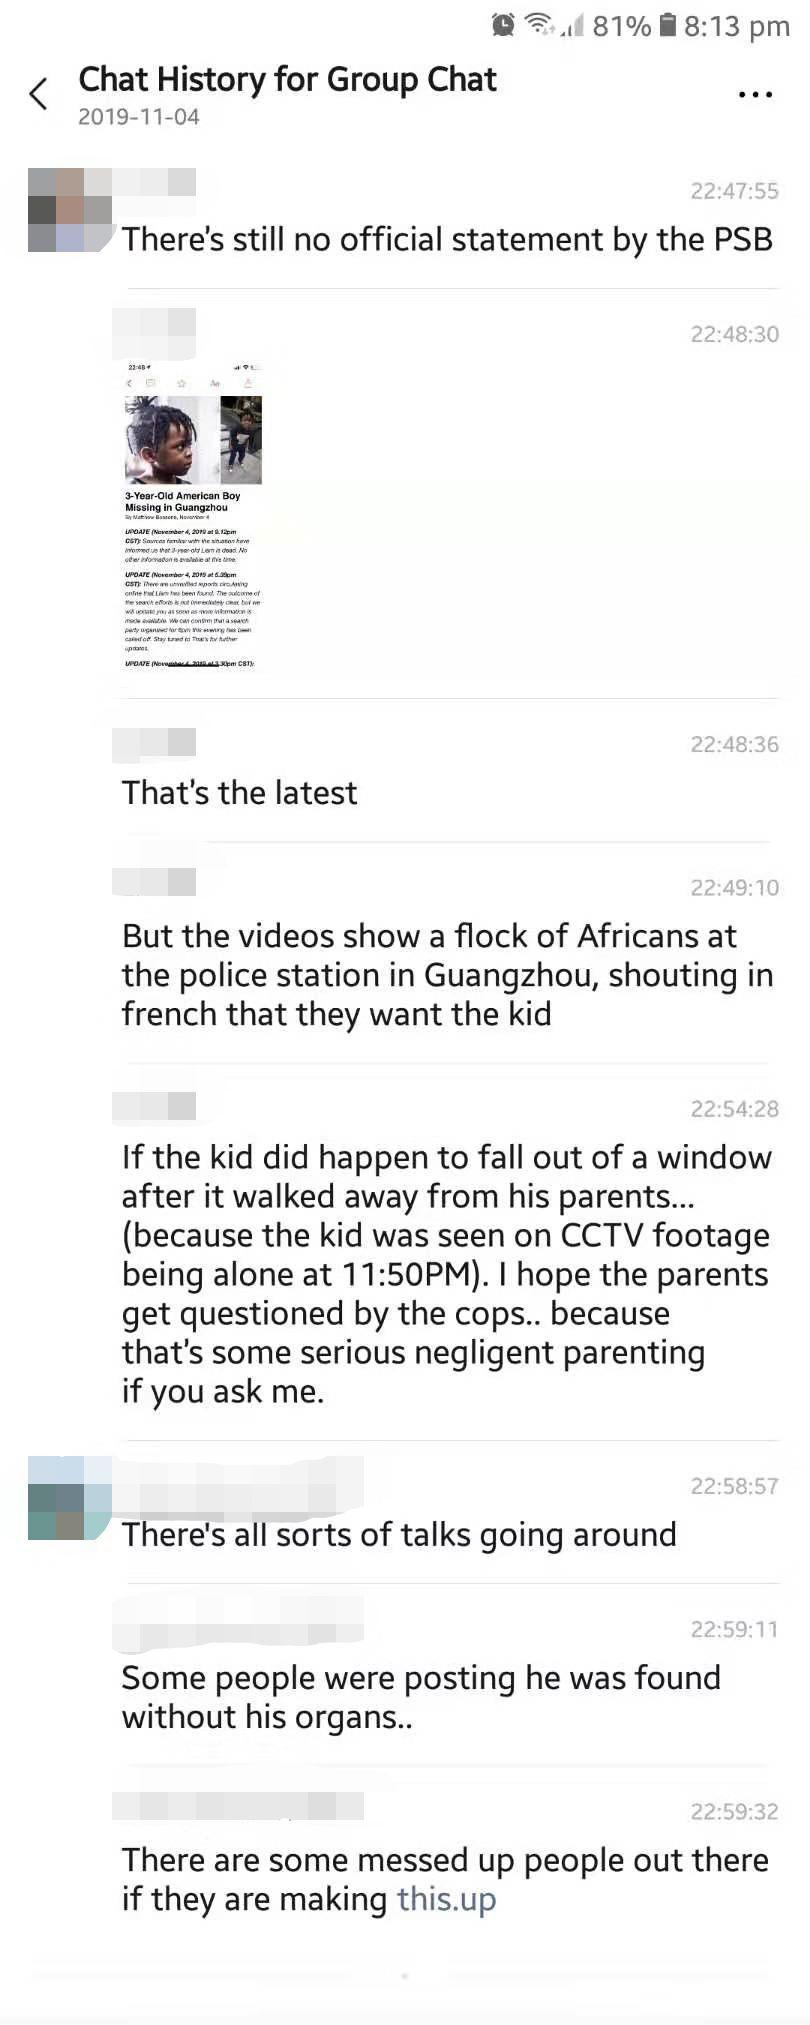 3-Year-Old American Boy Found DEAD in Guangzhou?!